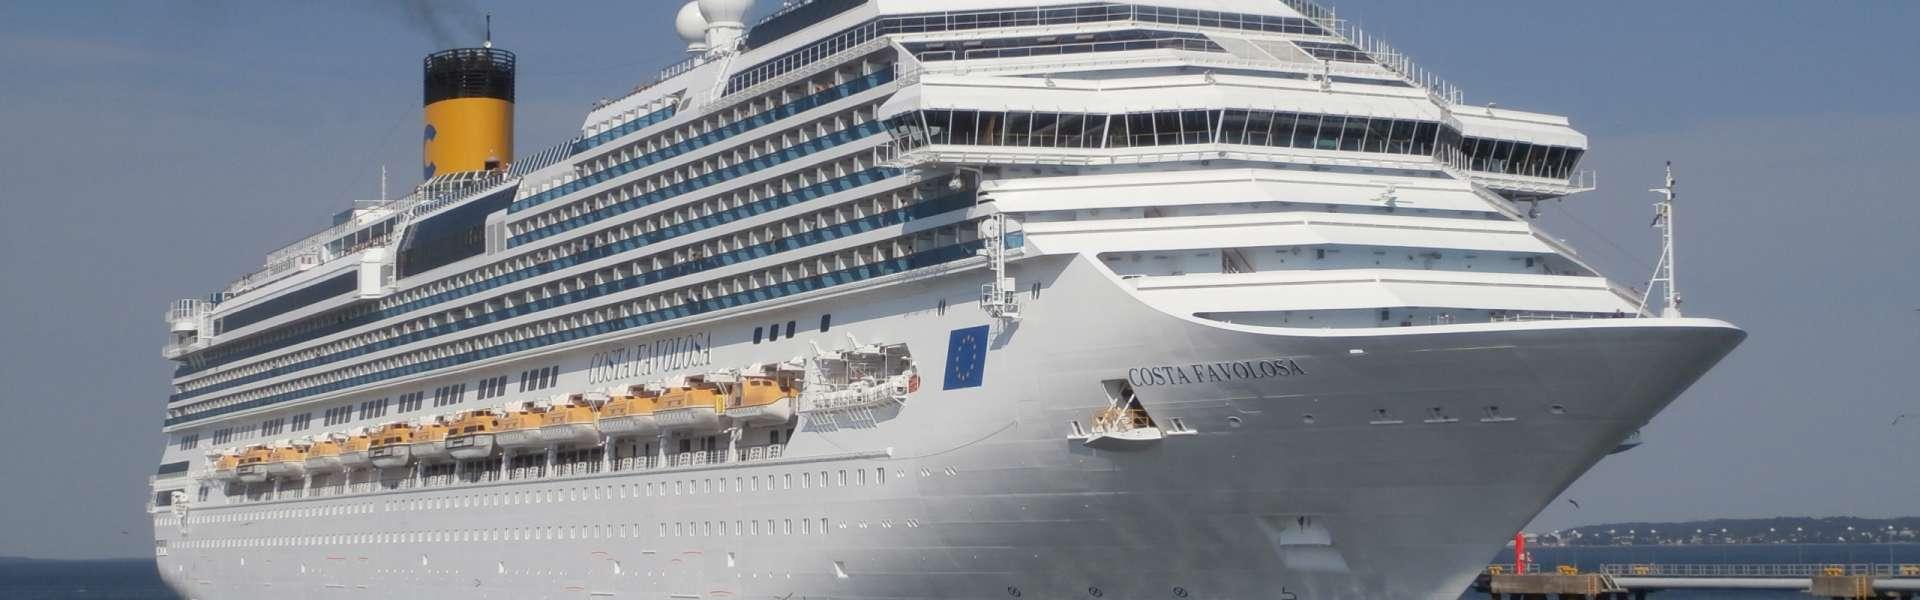 Croaziera 2019 - Mediterana de Vest (Barcelona) - Costa Cruises - Costa Favolosa - 10 nopti